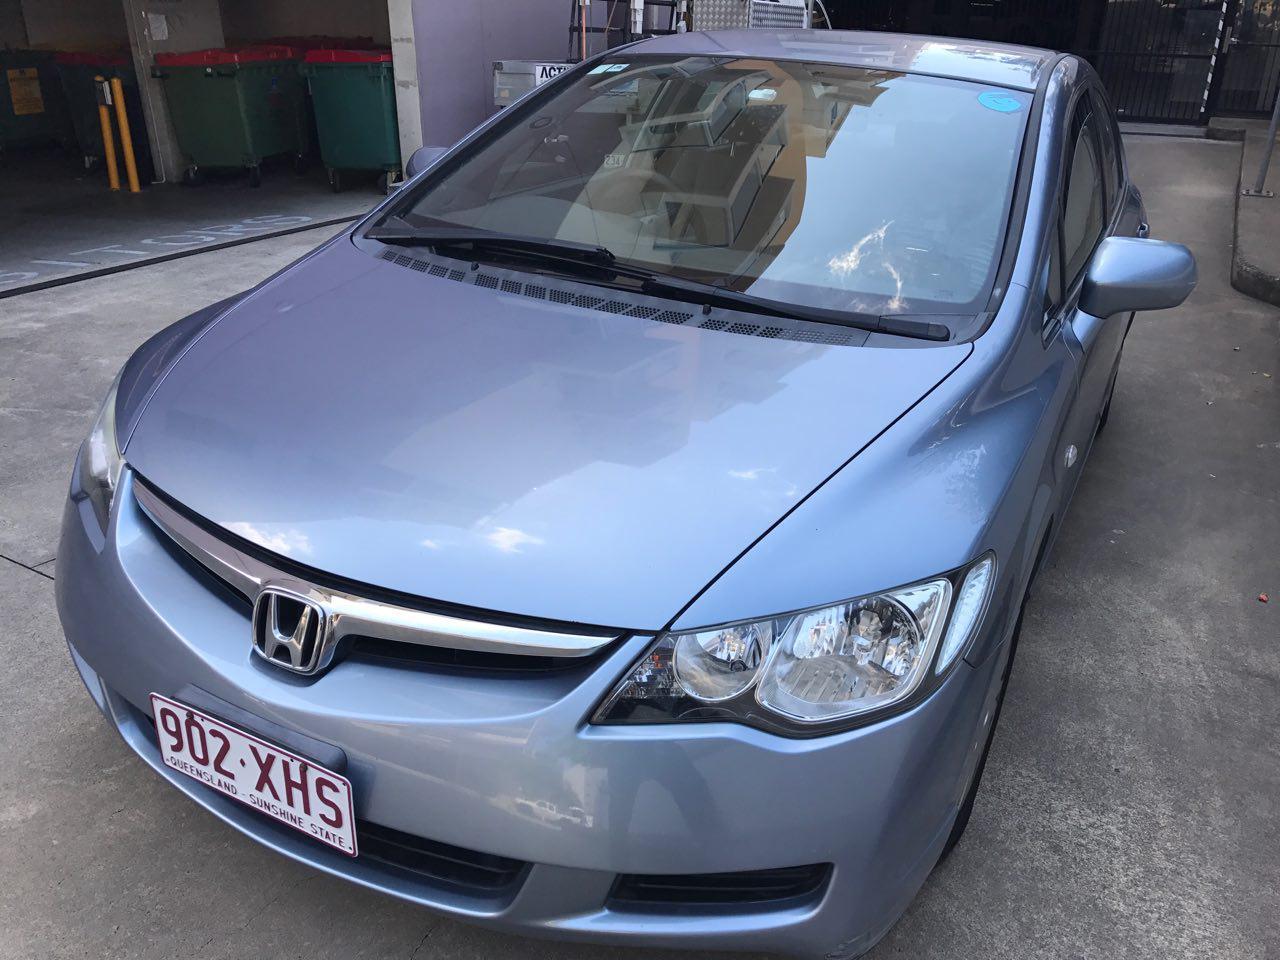 Picture of Meng Haur's 2006 Honda Civic